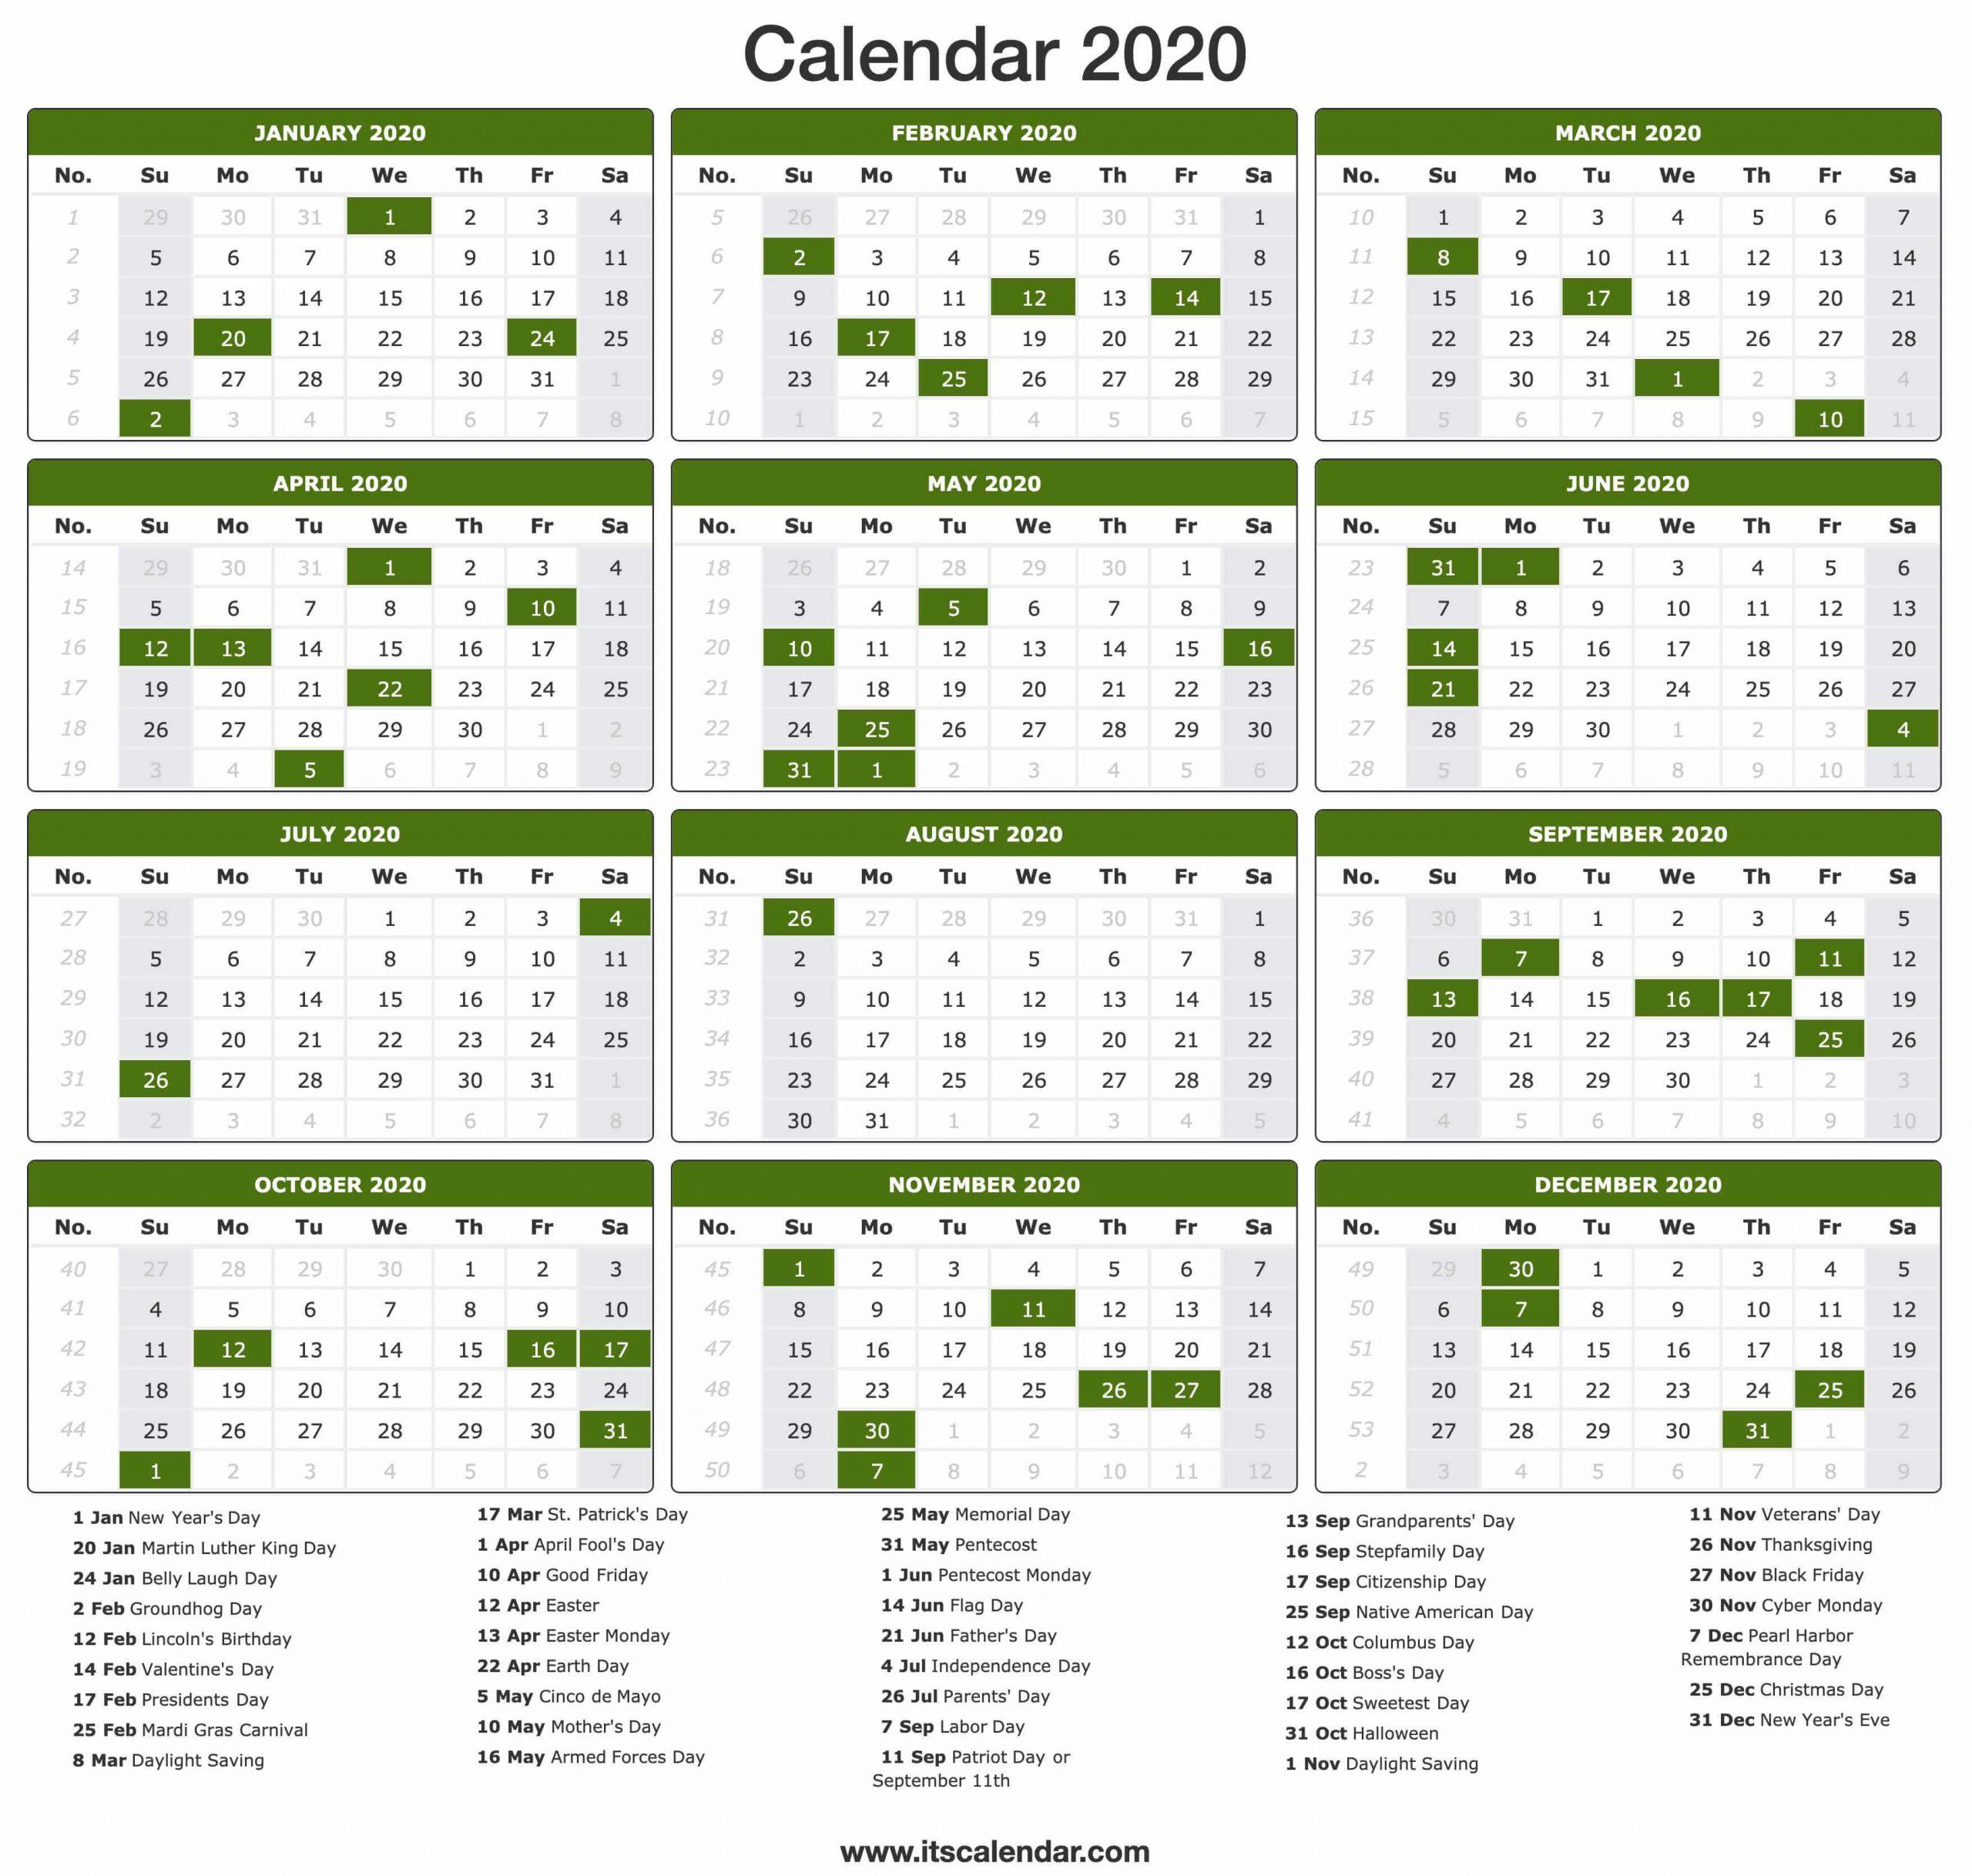 2020 Calendar | Printable 2020 Calendar